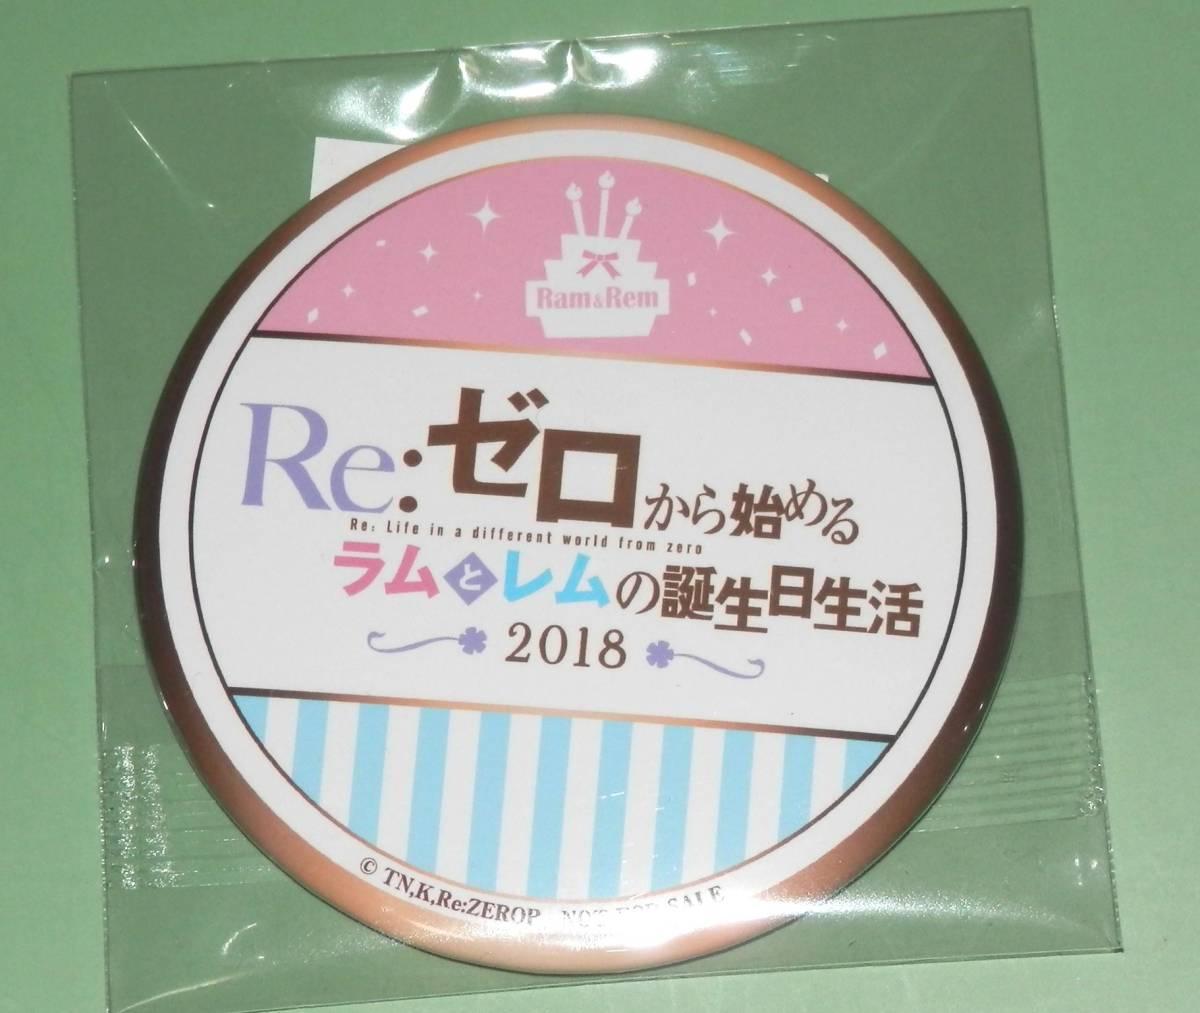 Re:ゼロから始めるラムとレムの誕生日生活2018 in 渋谷マルイ 再来店感謝特典 イベントロゴカンバッジ Re:ゼロから始める異世界生活